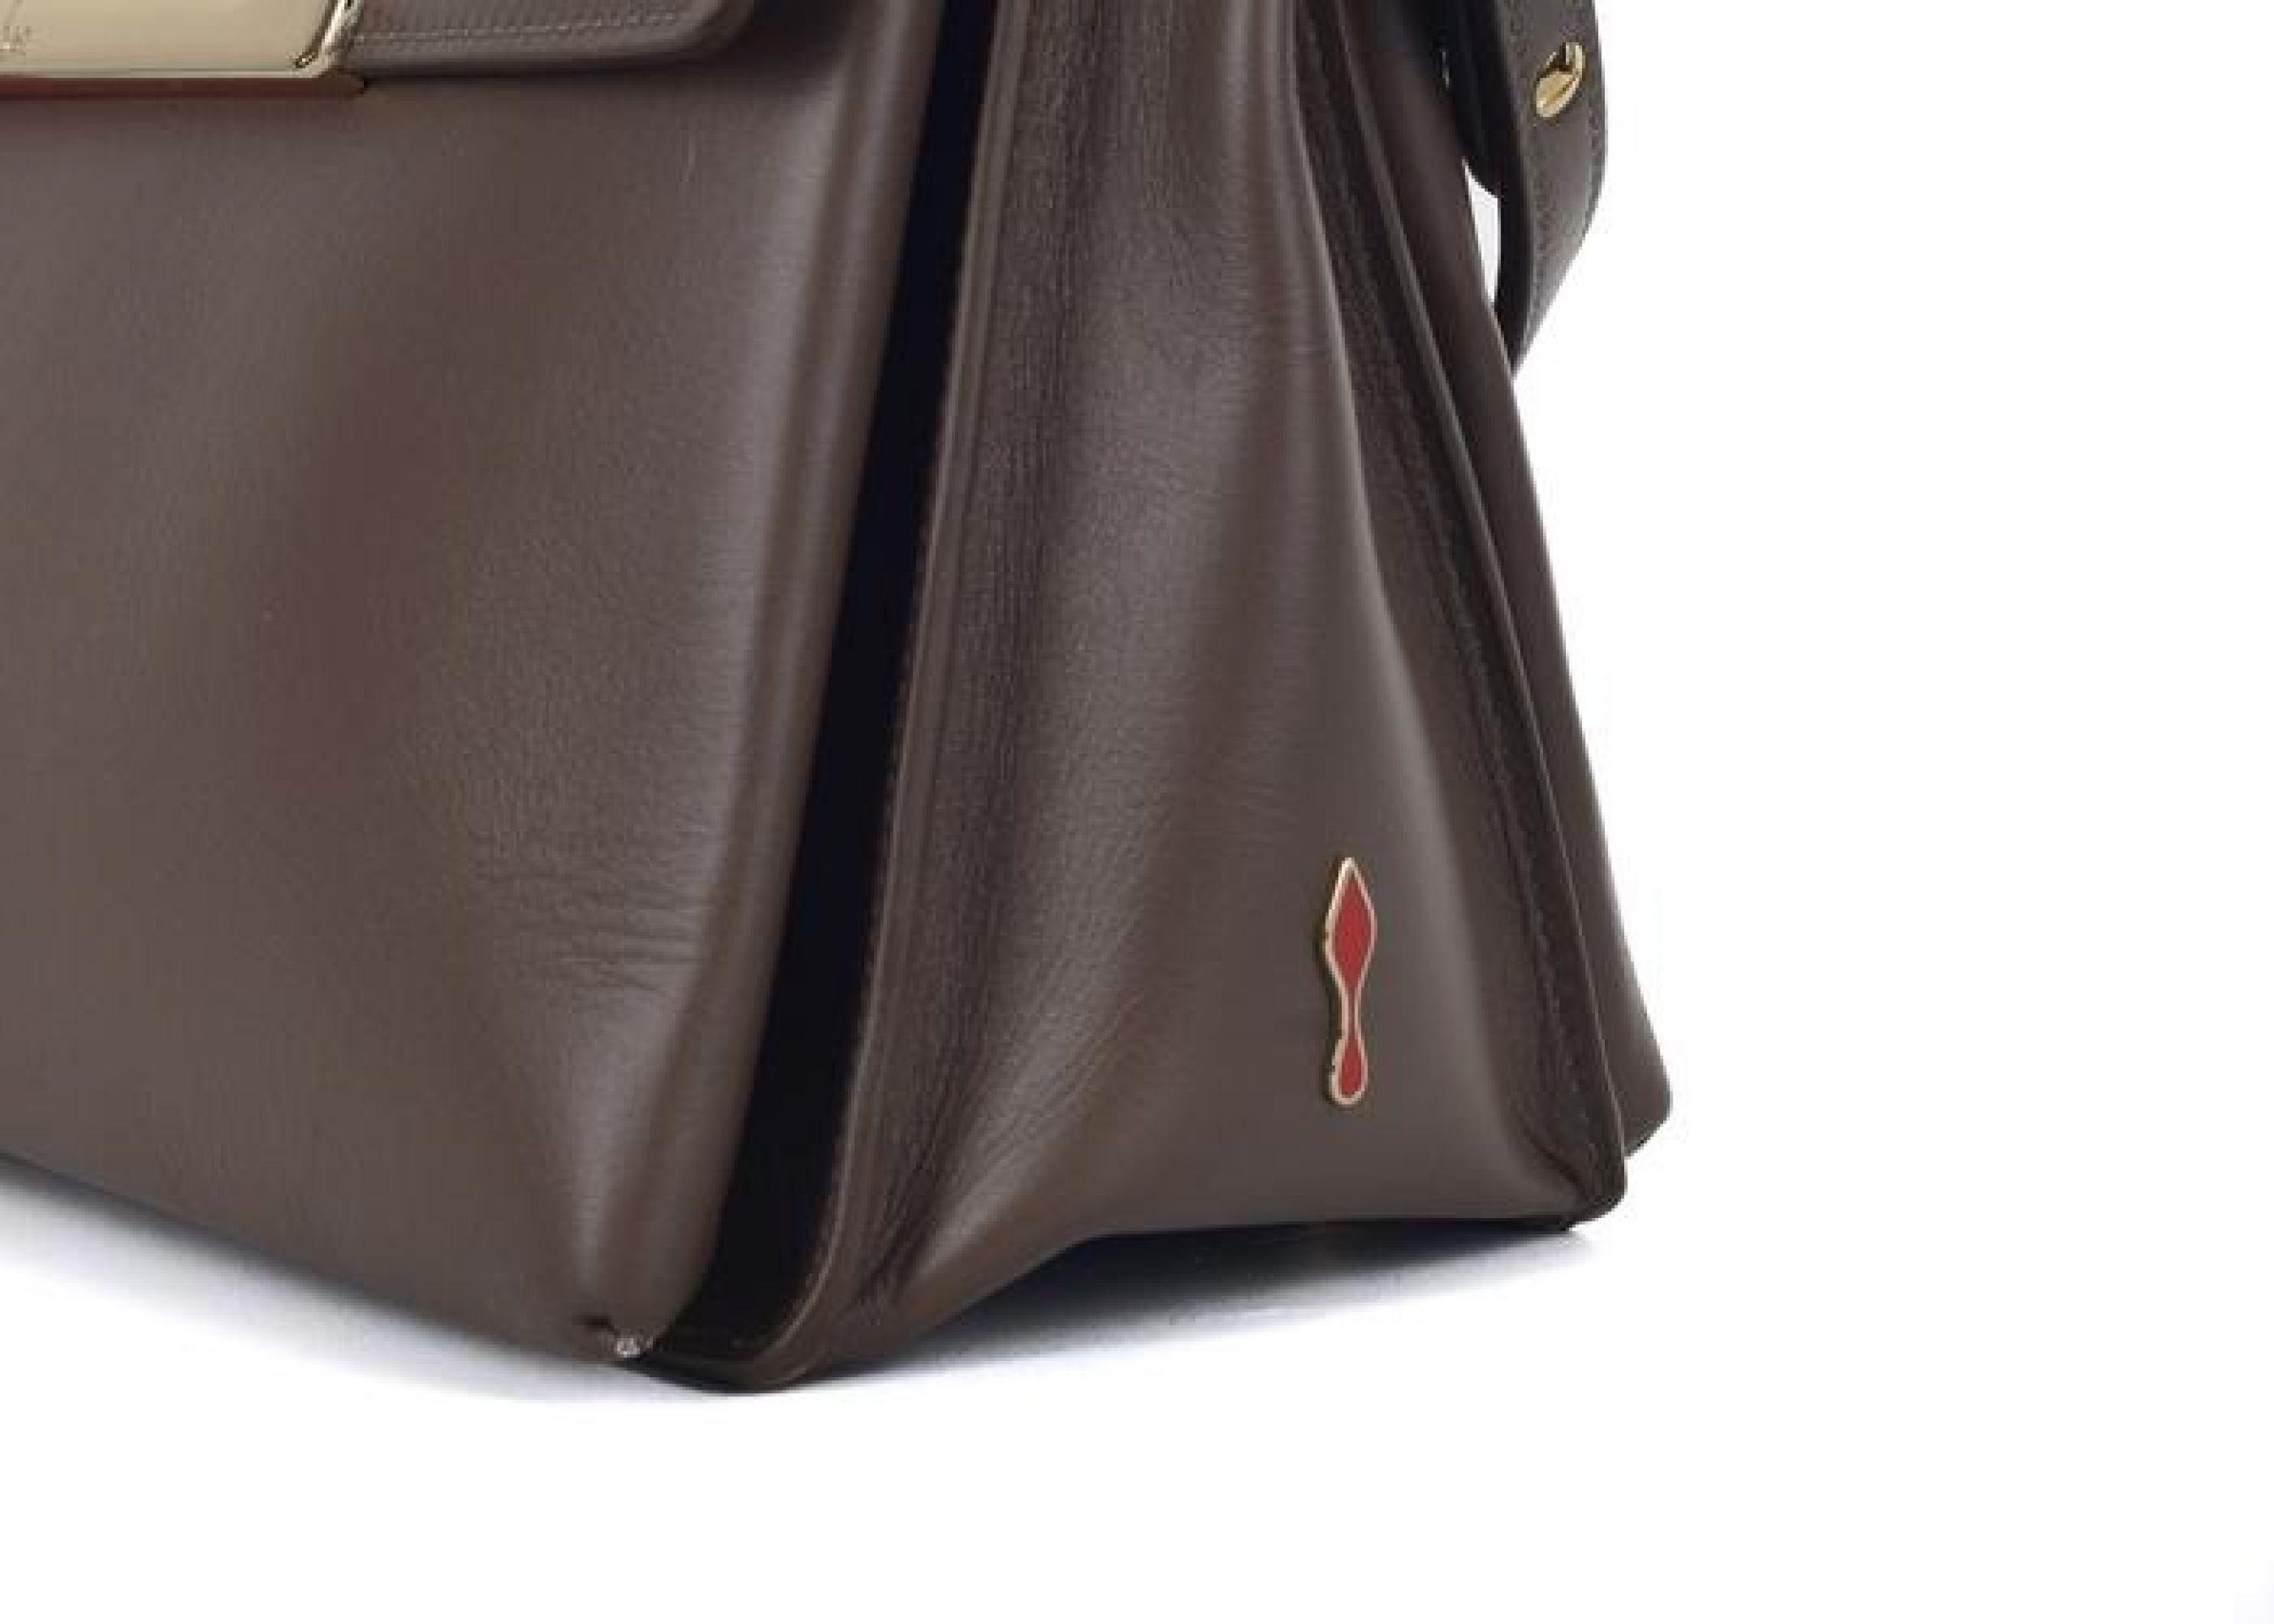 CHRISTIAN LOUBOUTIN WOMENS PASSAGE OMBRE MULTICOLRED MESSENGER BAG